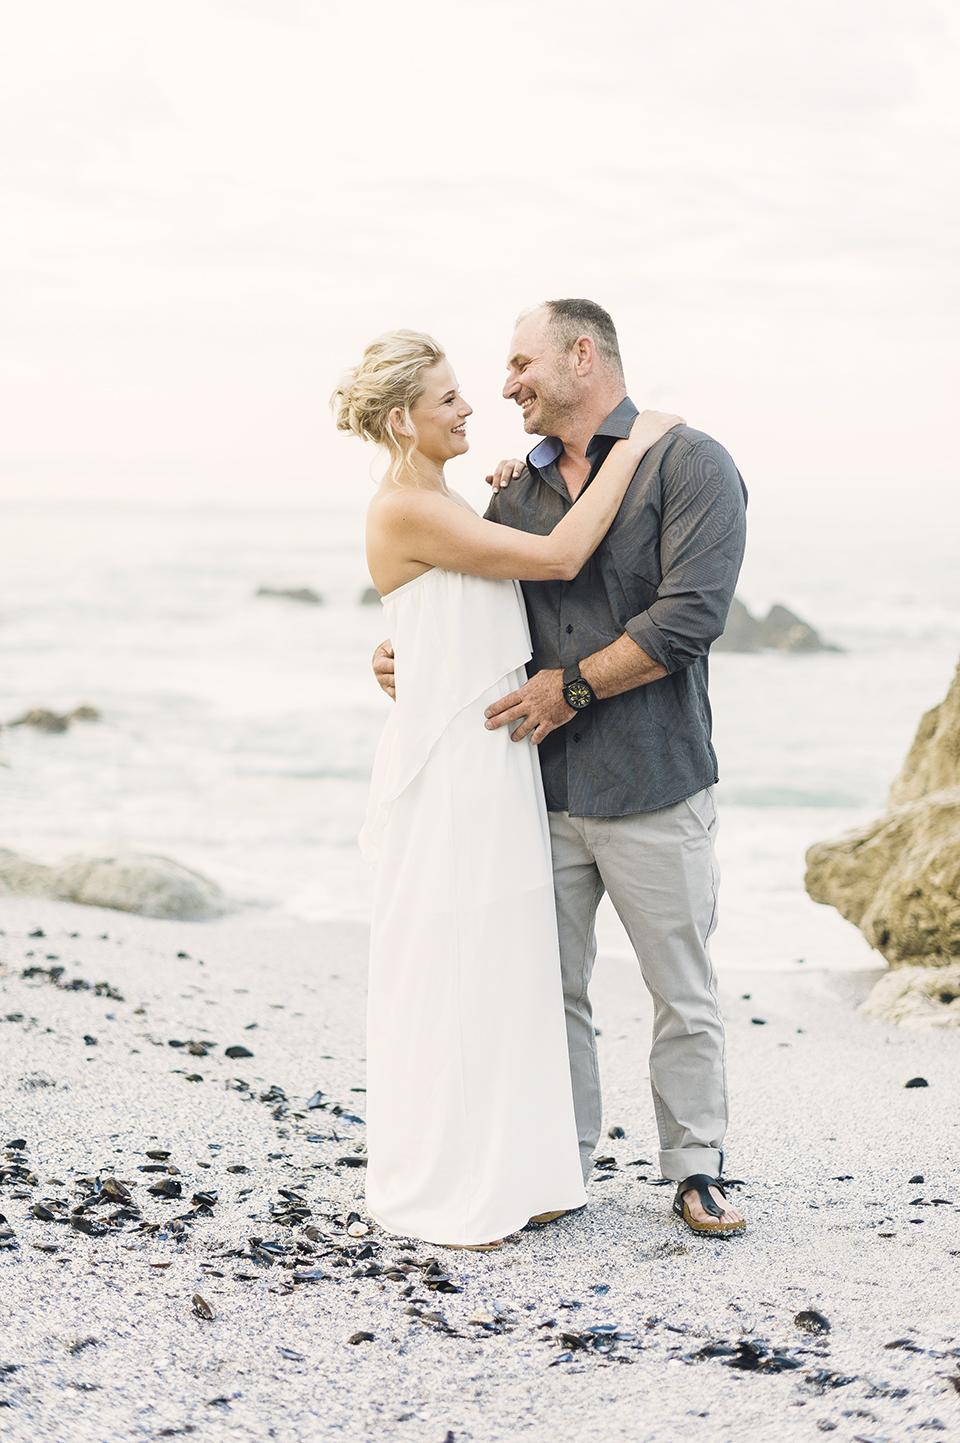 RyanParker_CapeTown_Photographer_Wedding_Hermanus_A&B_DSC_9130 2.jpg